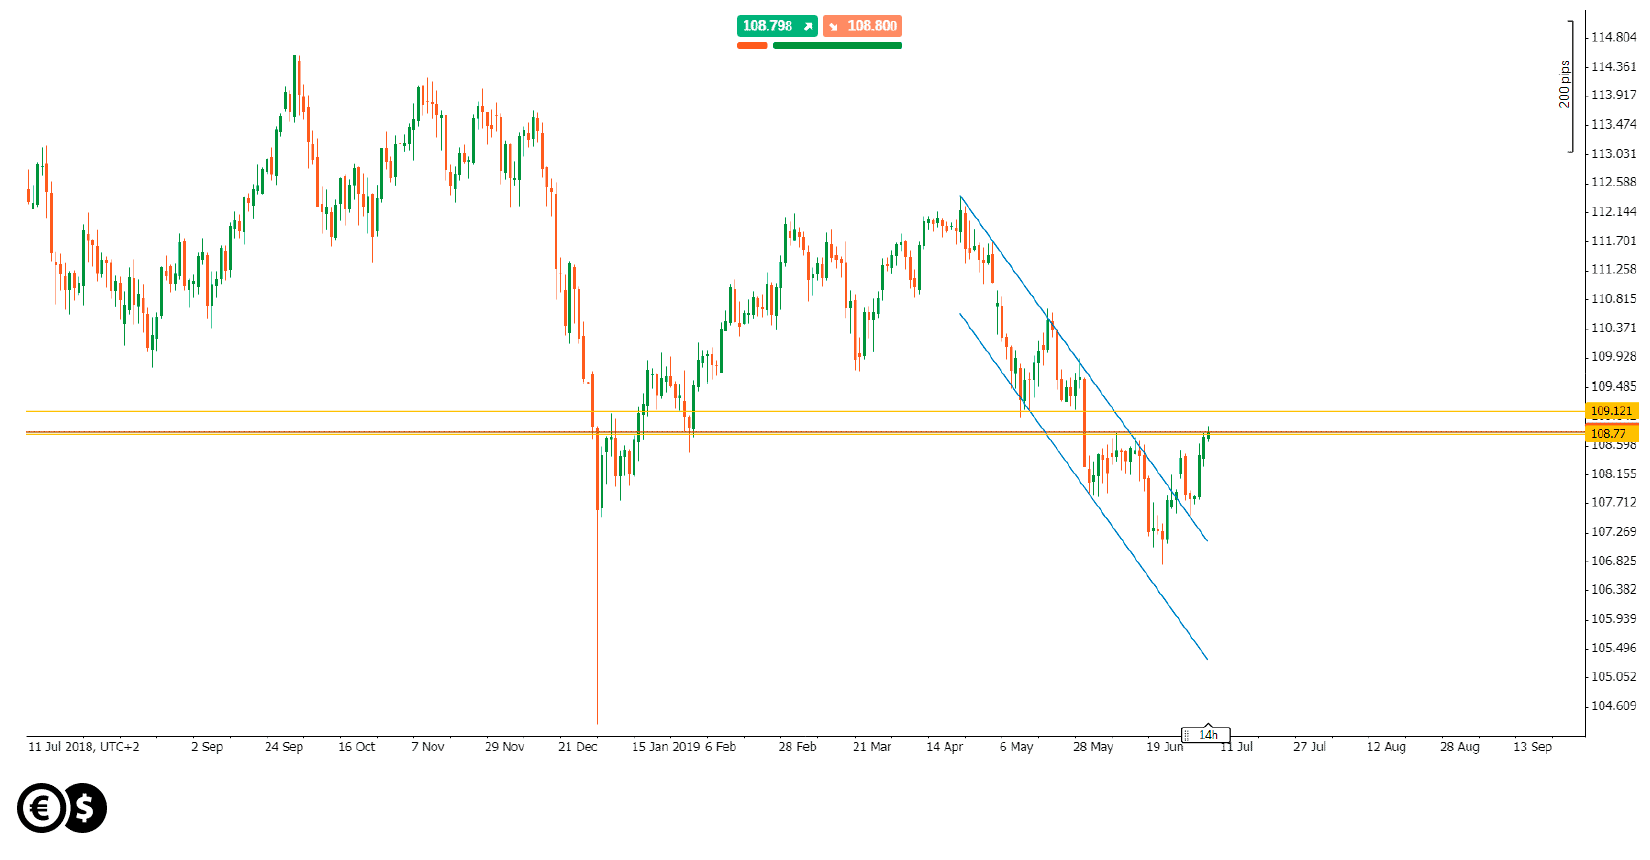 Kurs USD/JPY